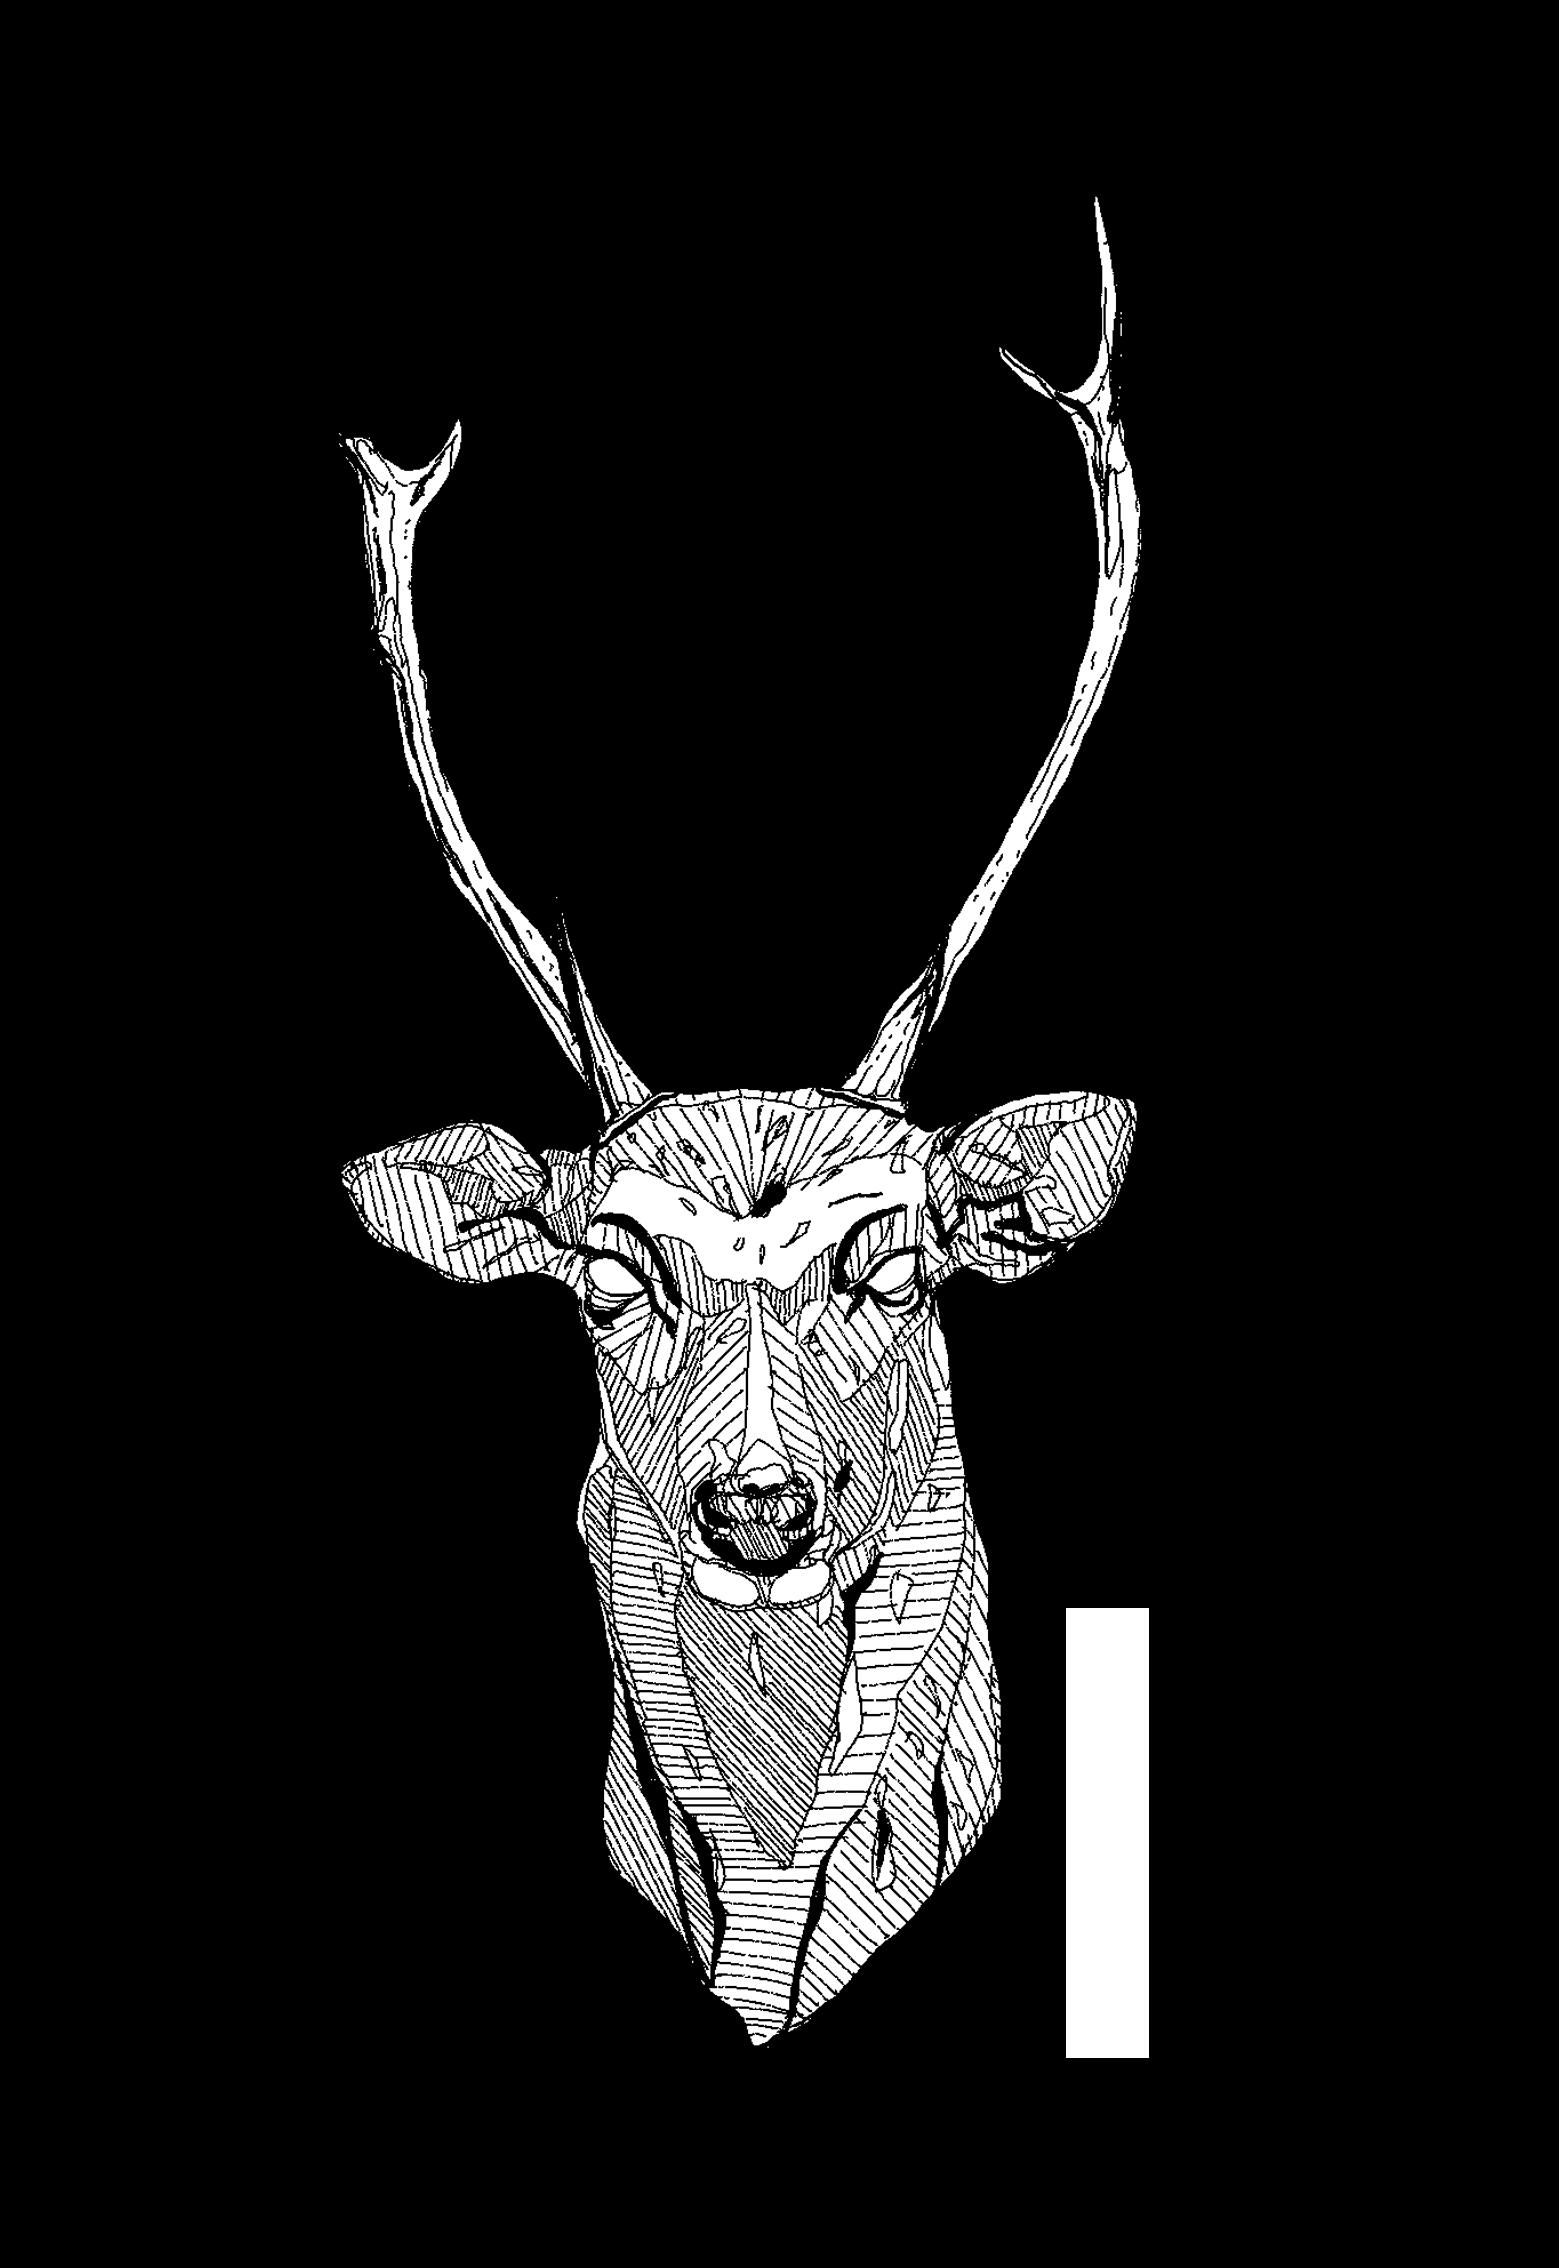 Deer_Narrow.png